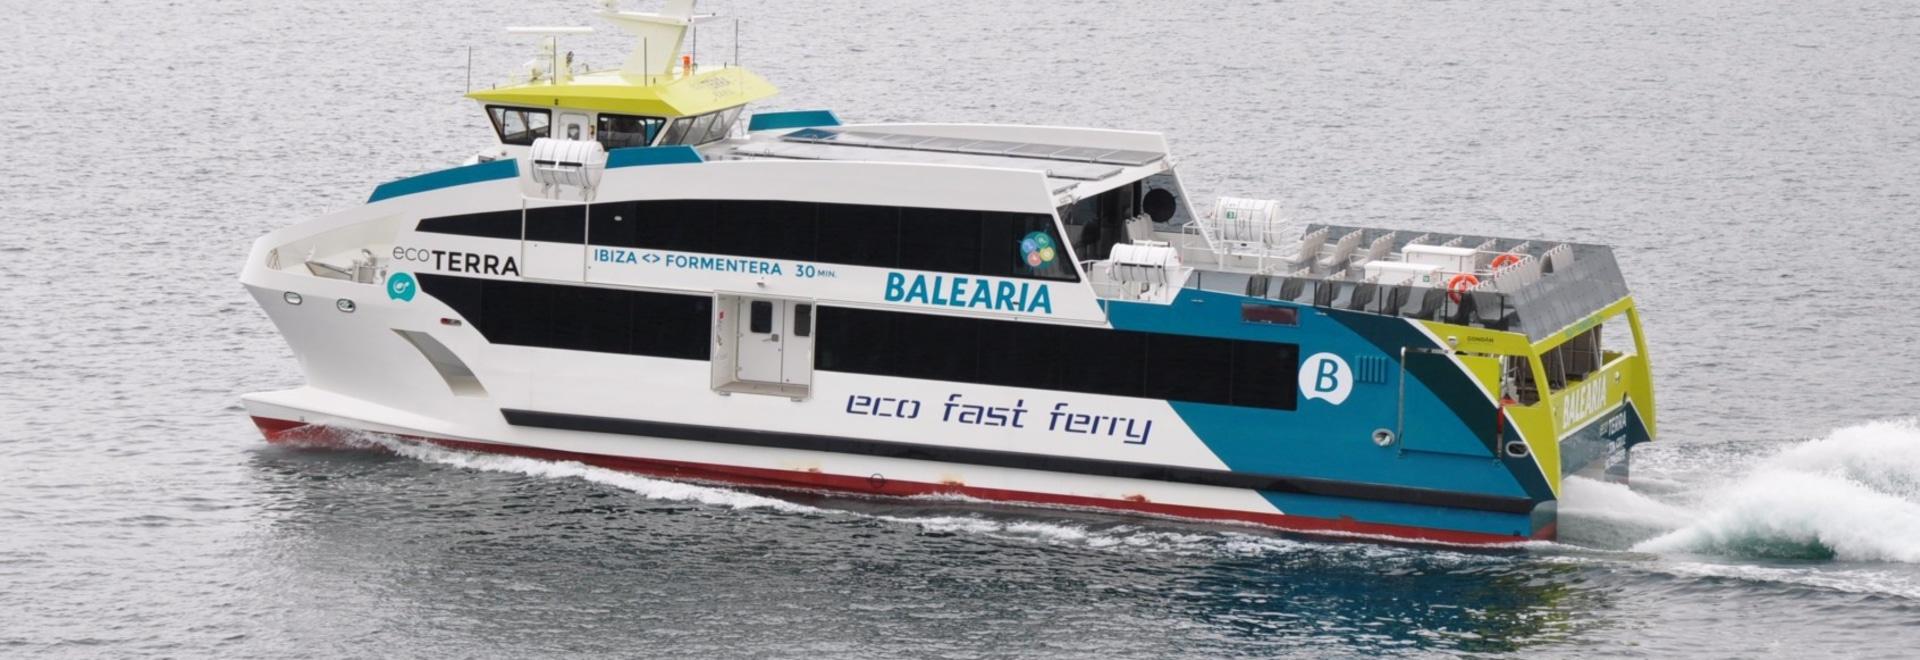 One of Gondan's latest Eco Fast Ferries